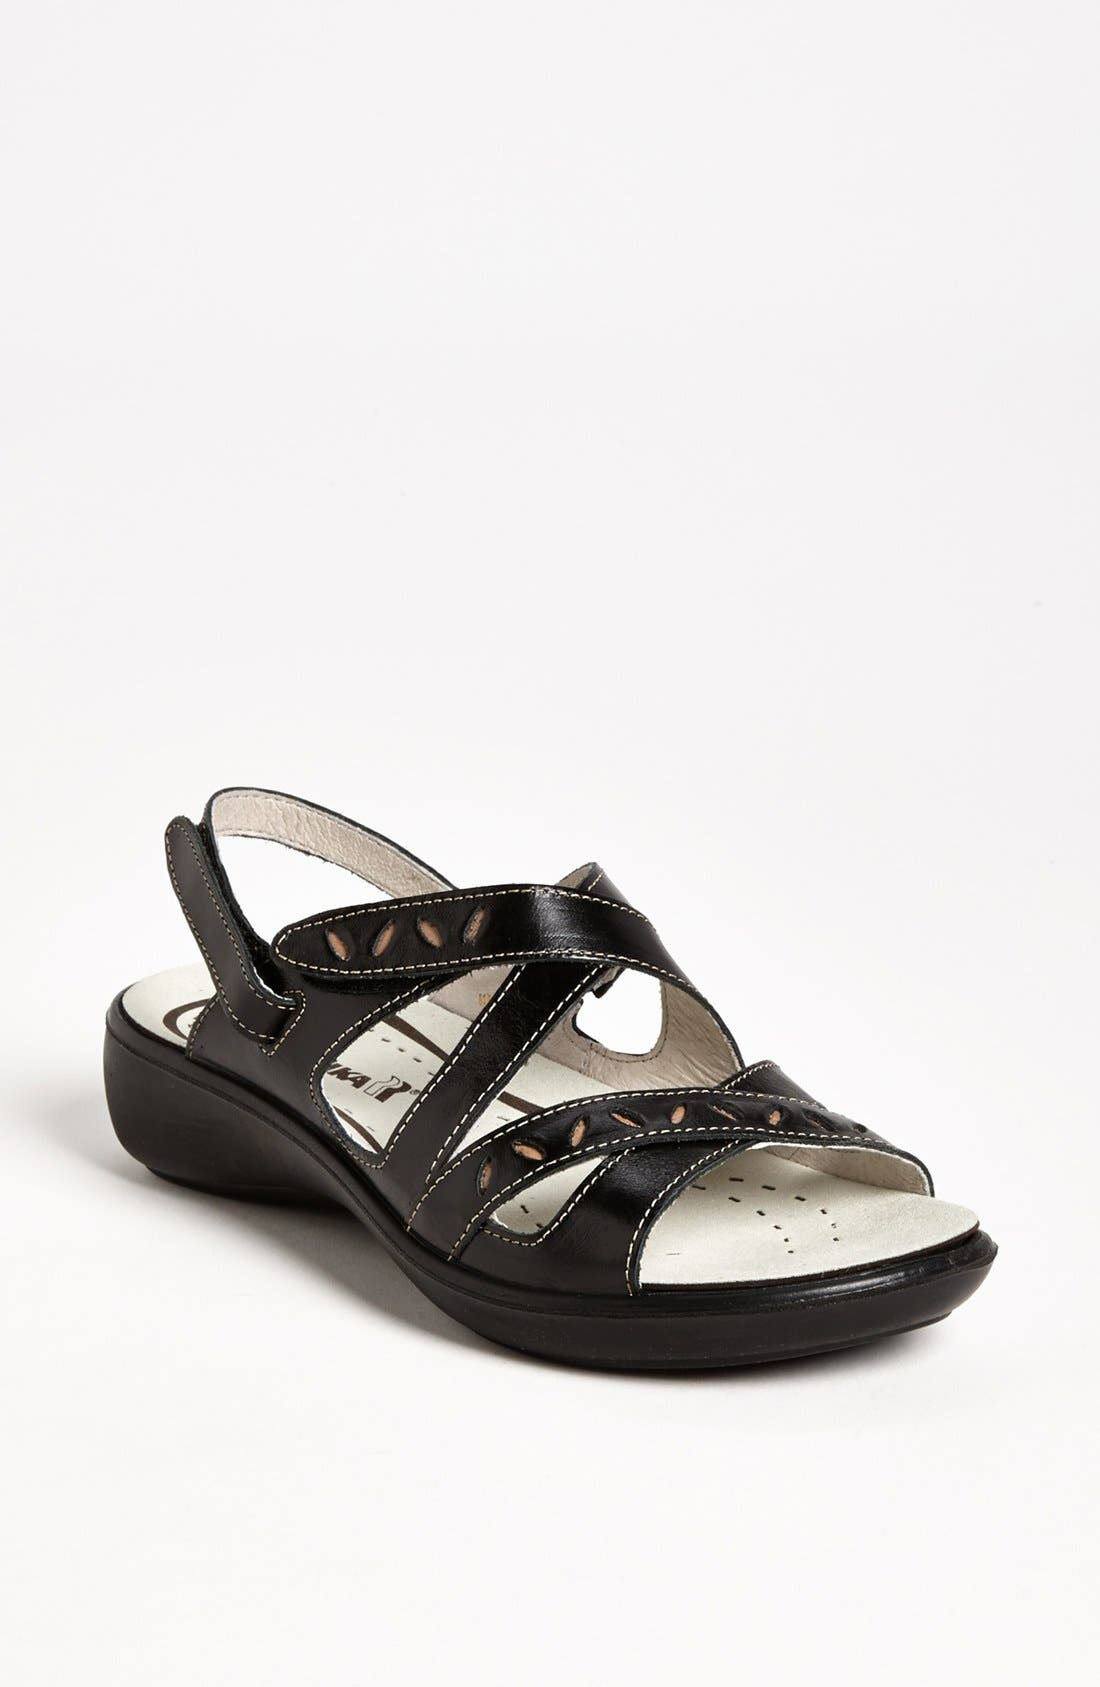 Alternate Image 1 Selected - Romika® 'Ibiza 44' Sandal